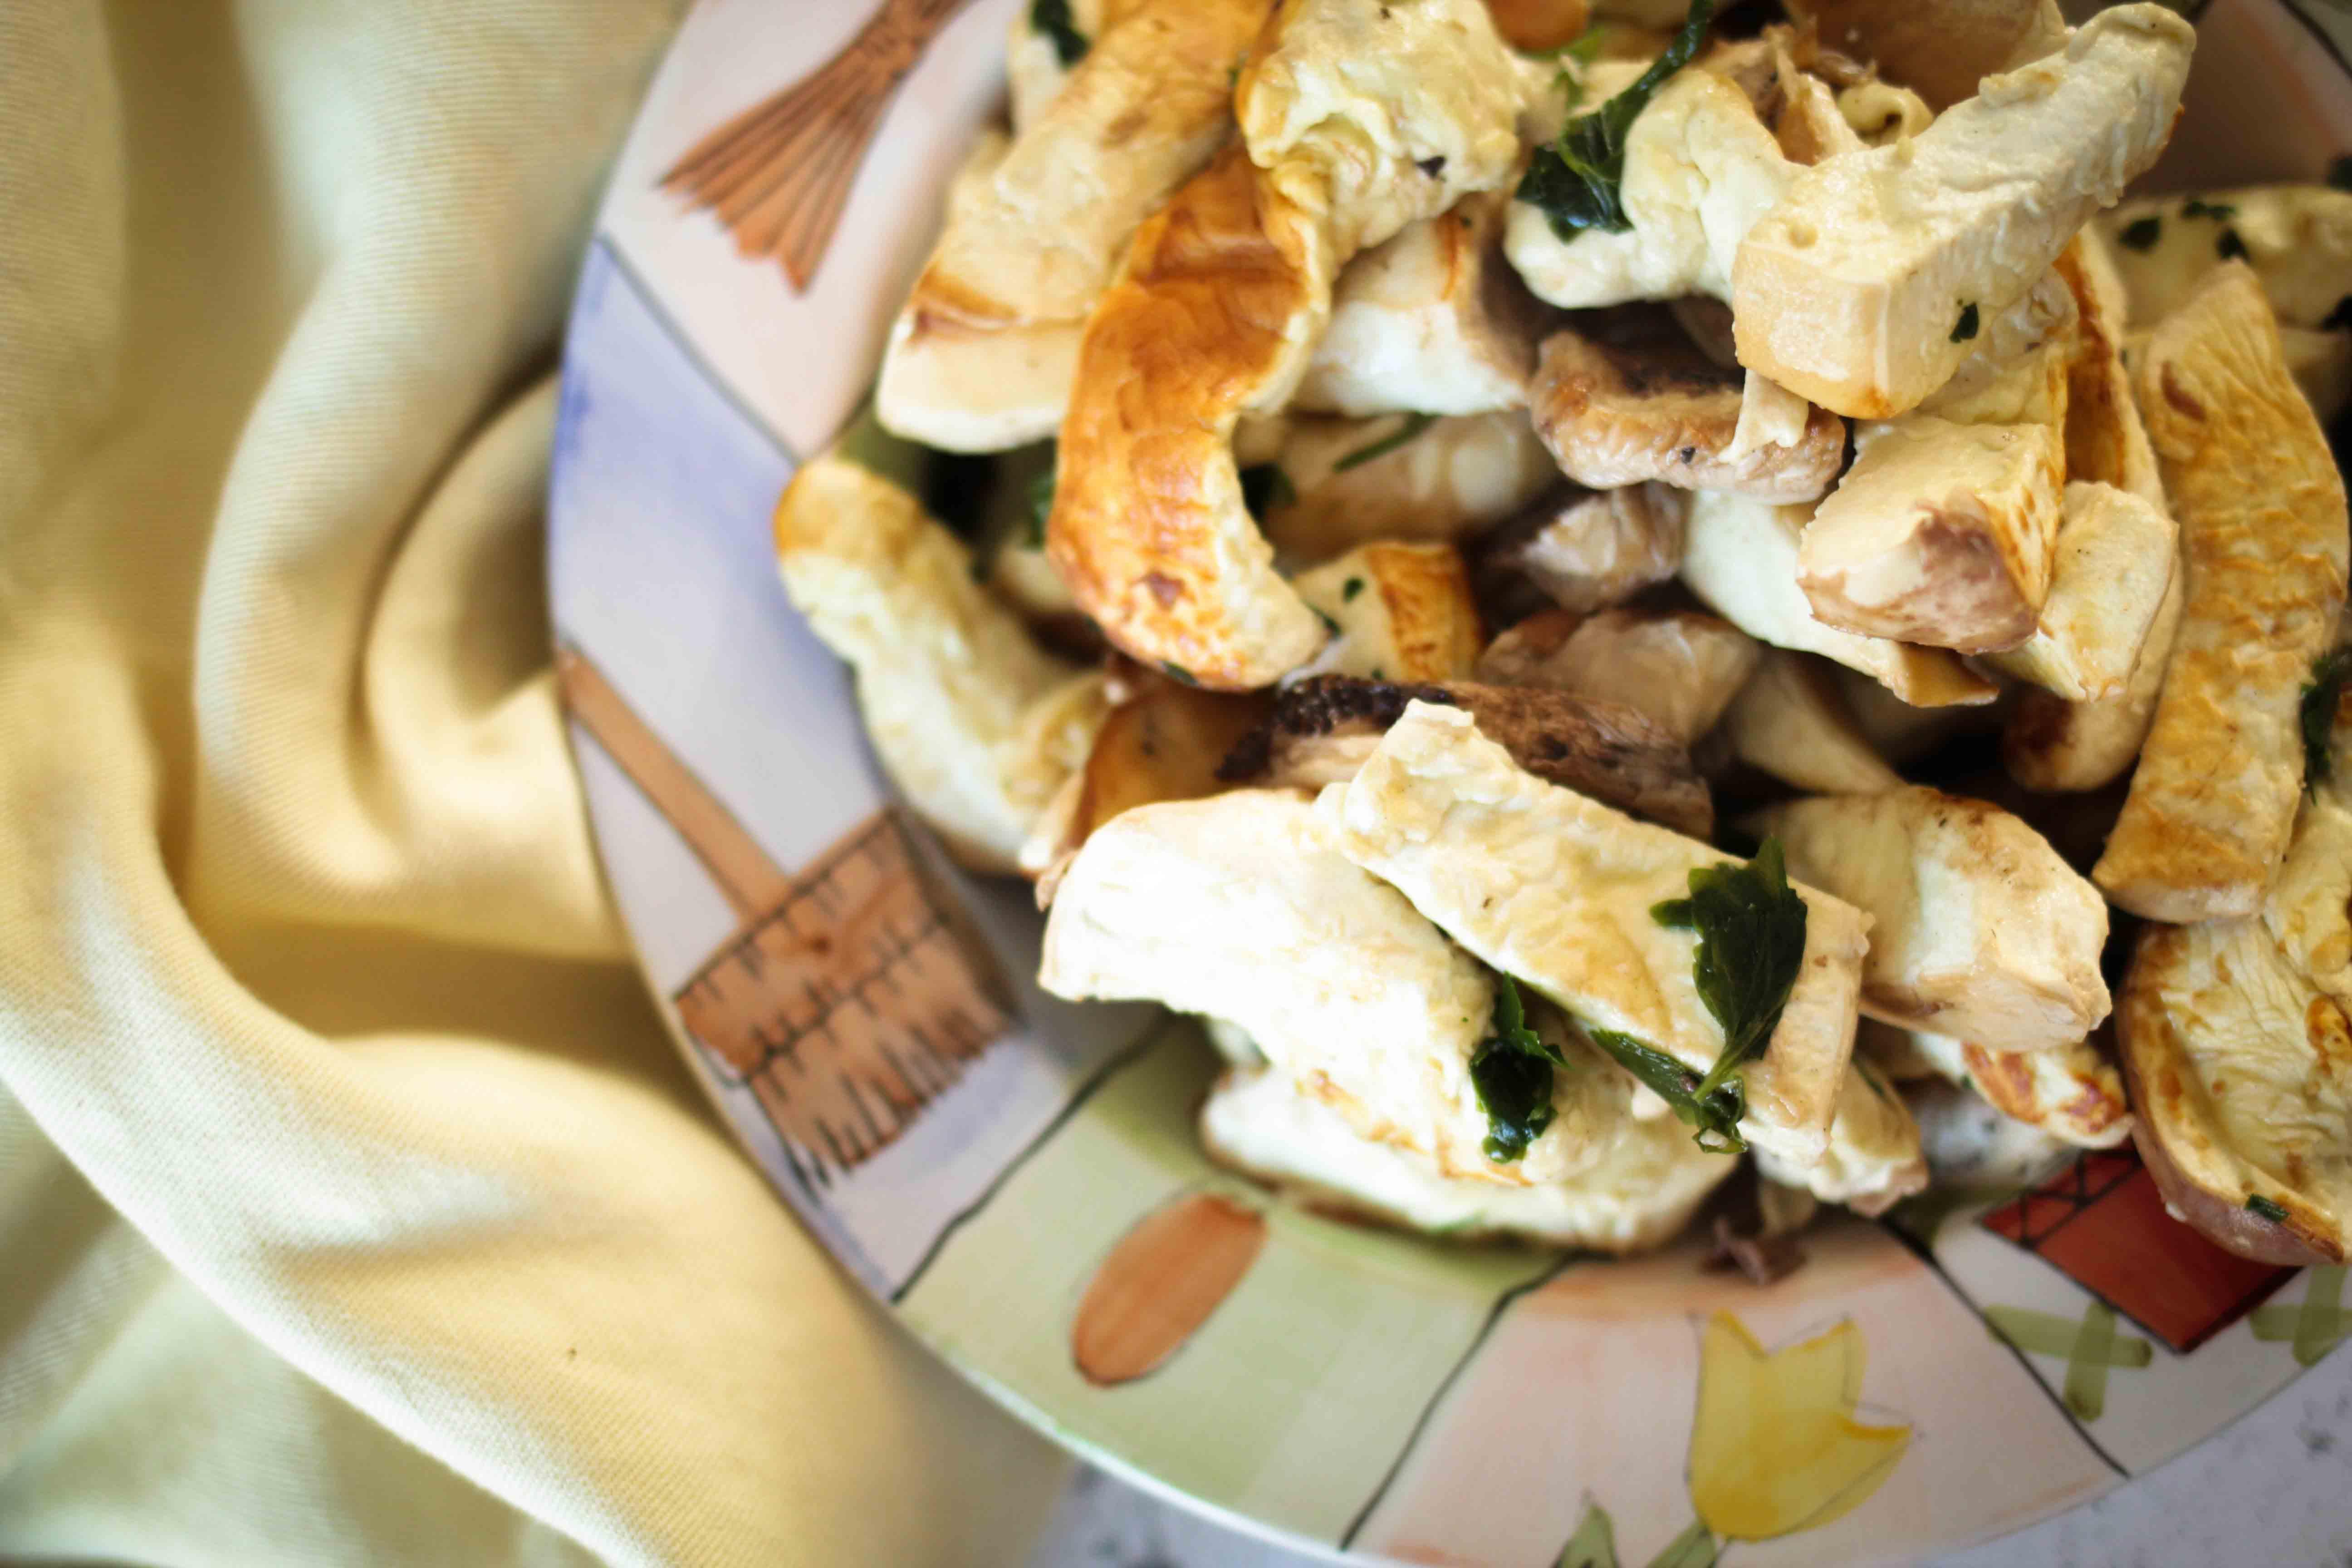 claudialeclercq-edible mushrooms-champignons comestibles_-14